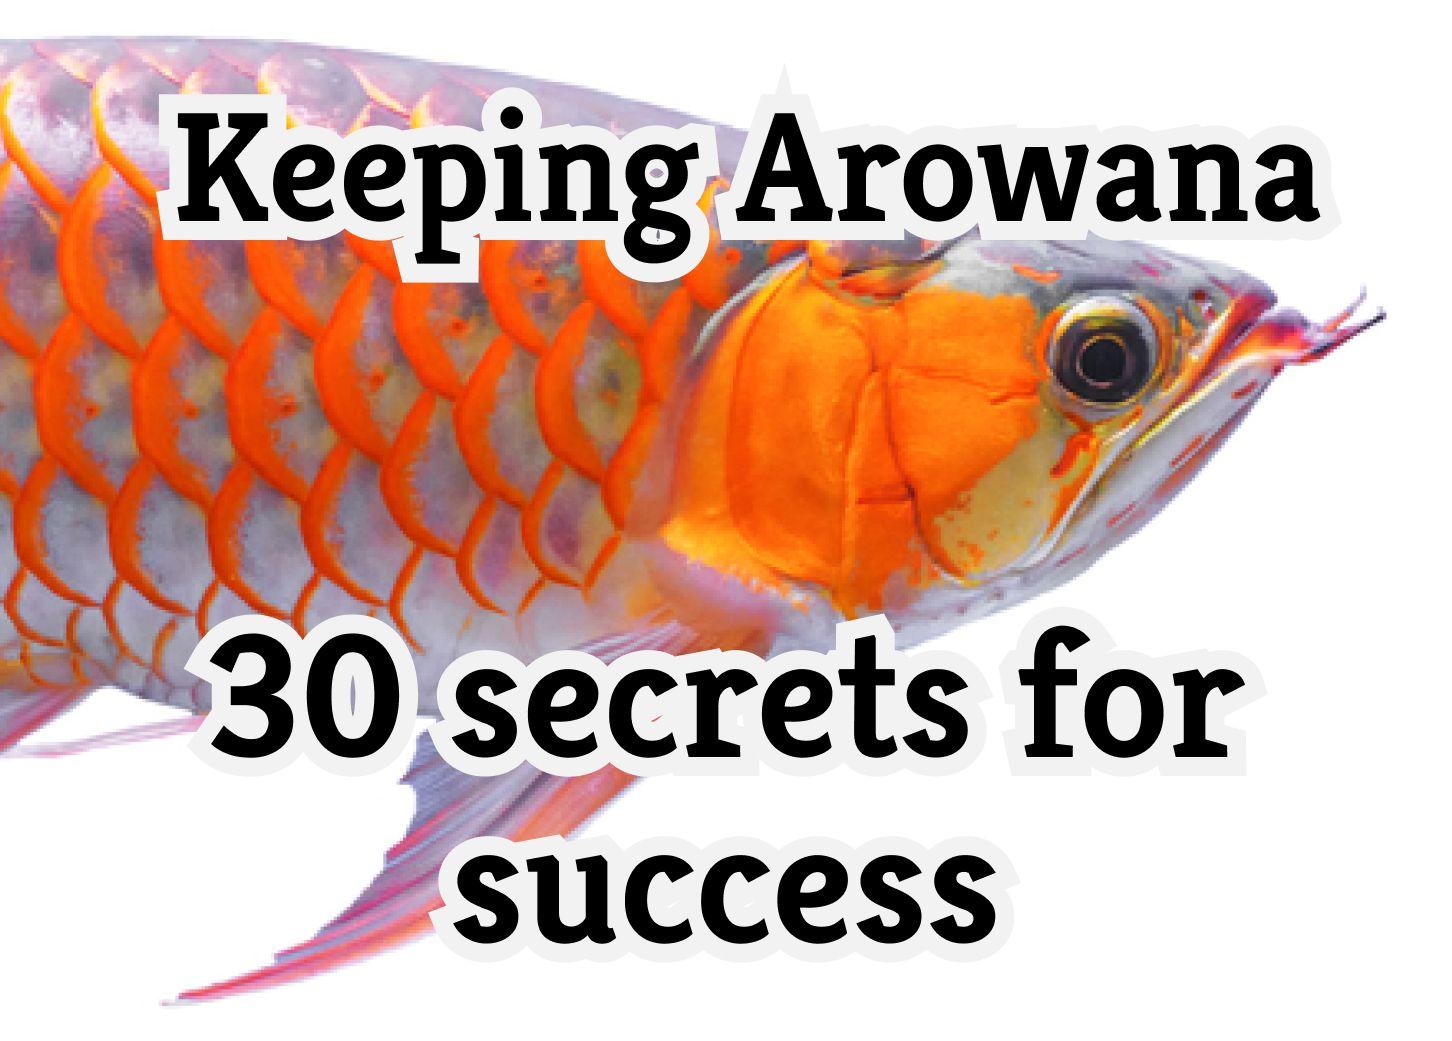 Keeping Arowana – 30 Secrets For Success